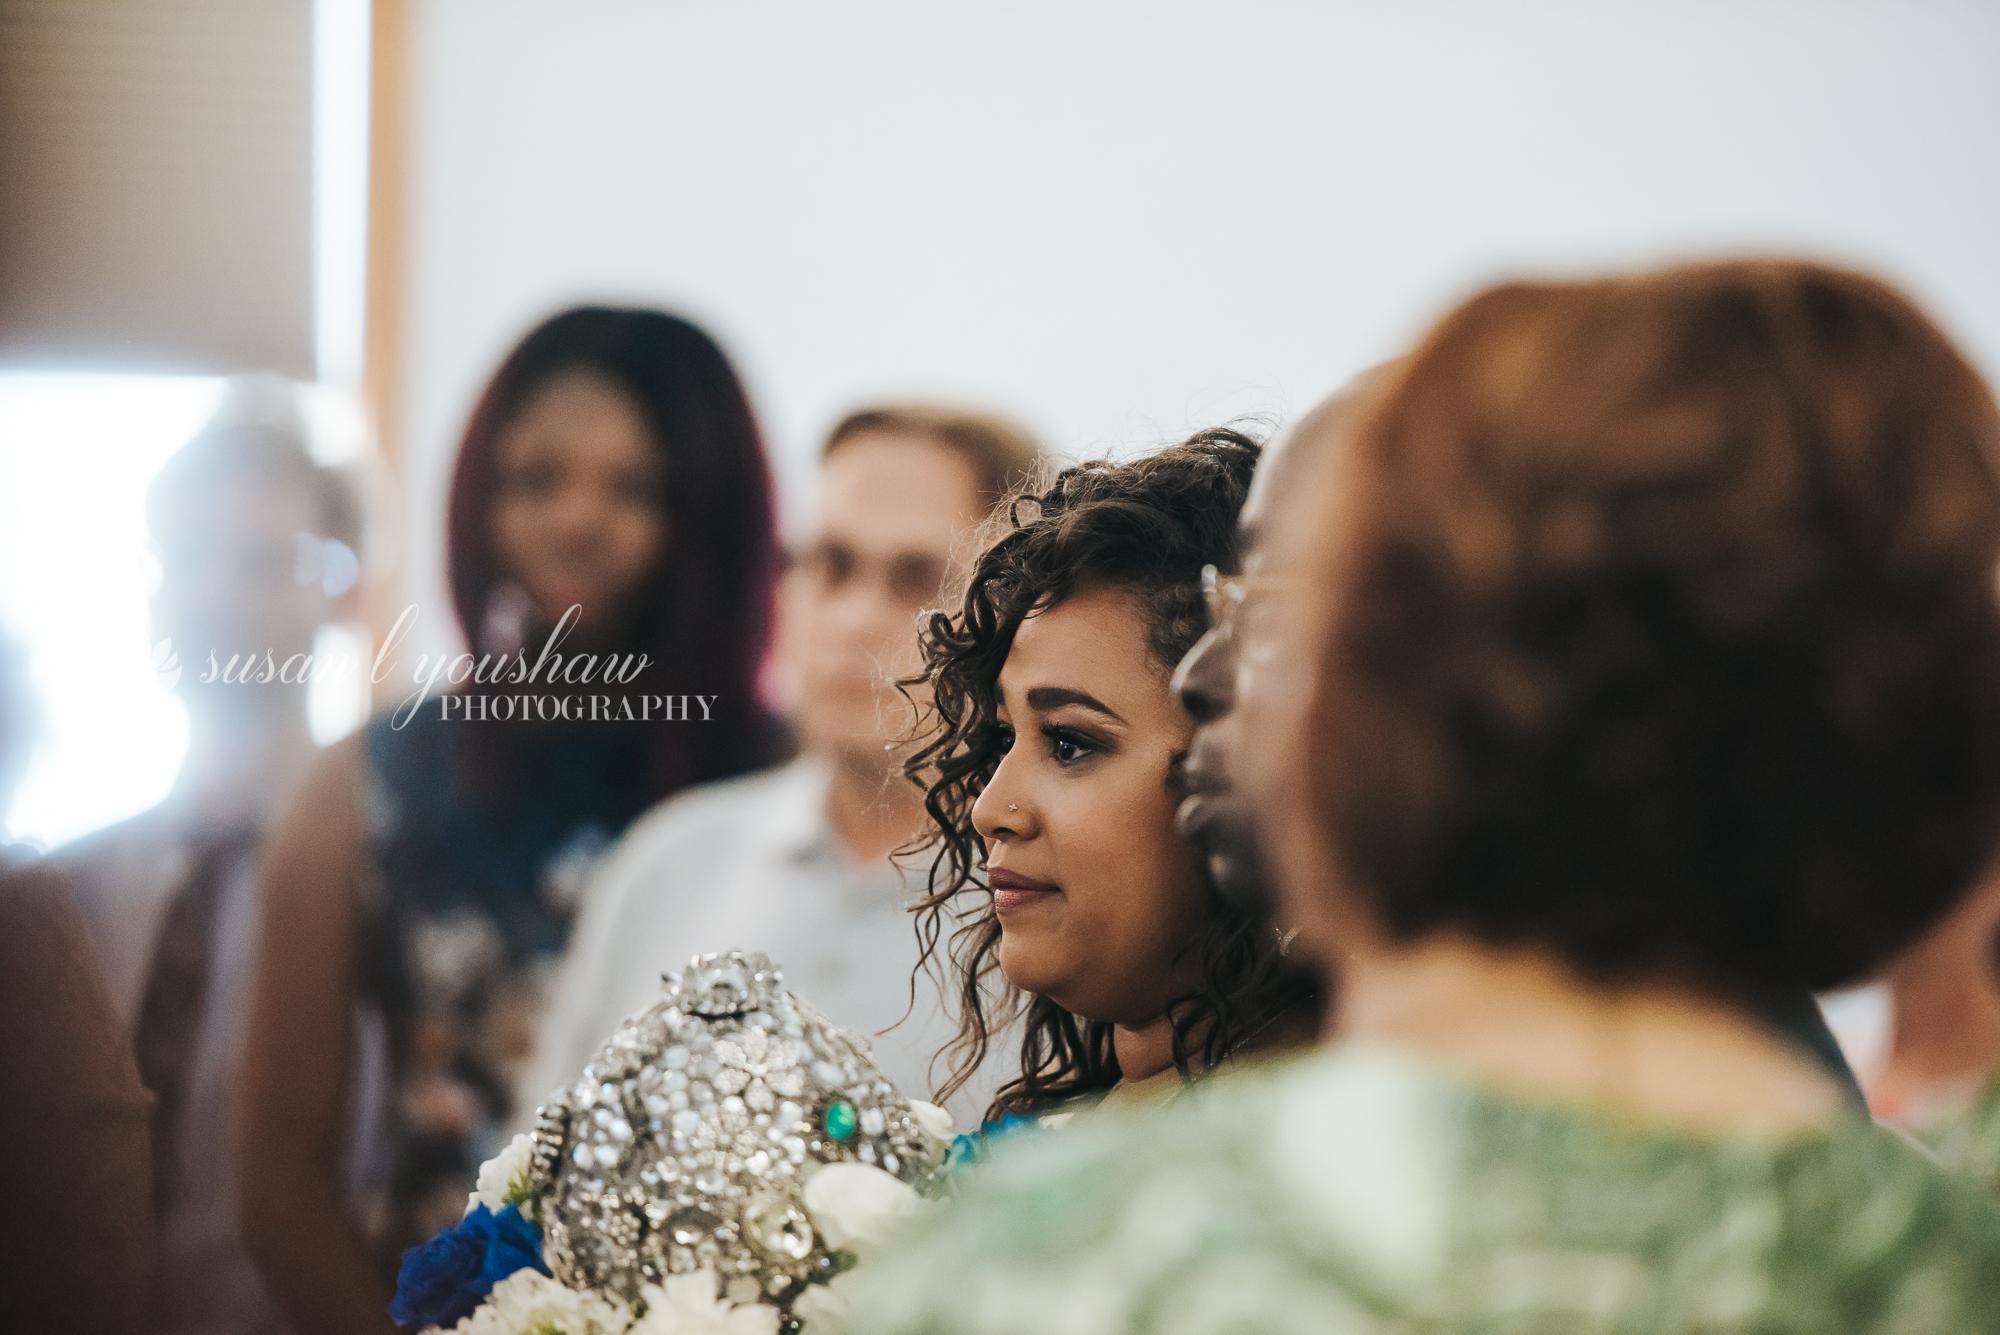 Katelyn and Wes Wedding Photos 07-13-2019 SLY Photography-59.jpg